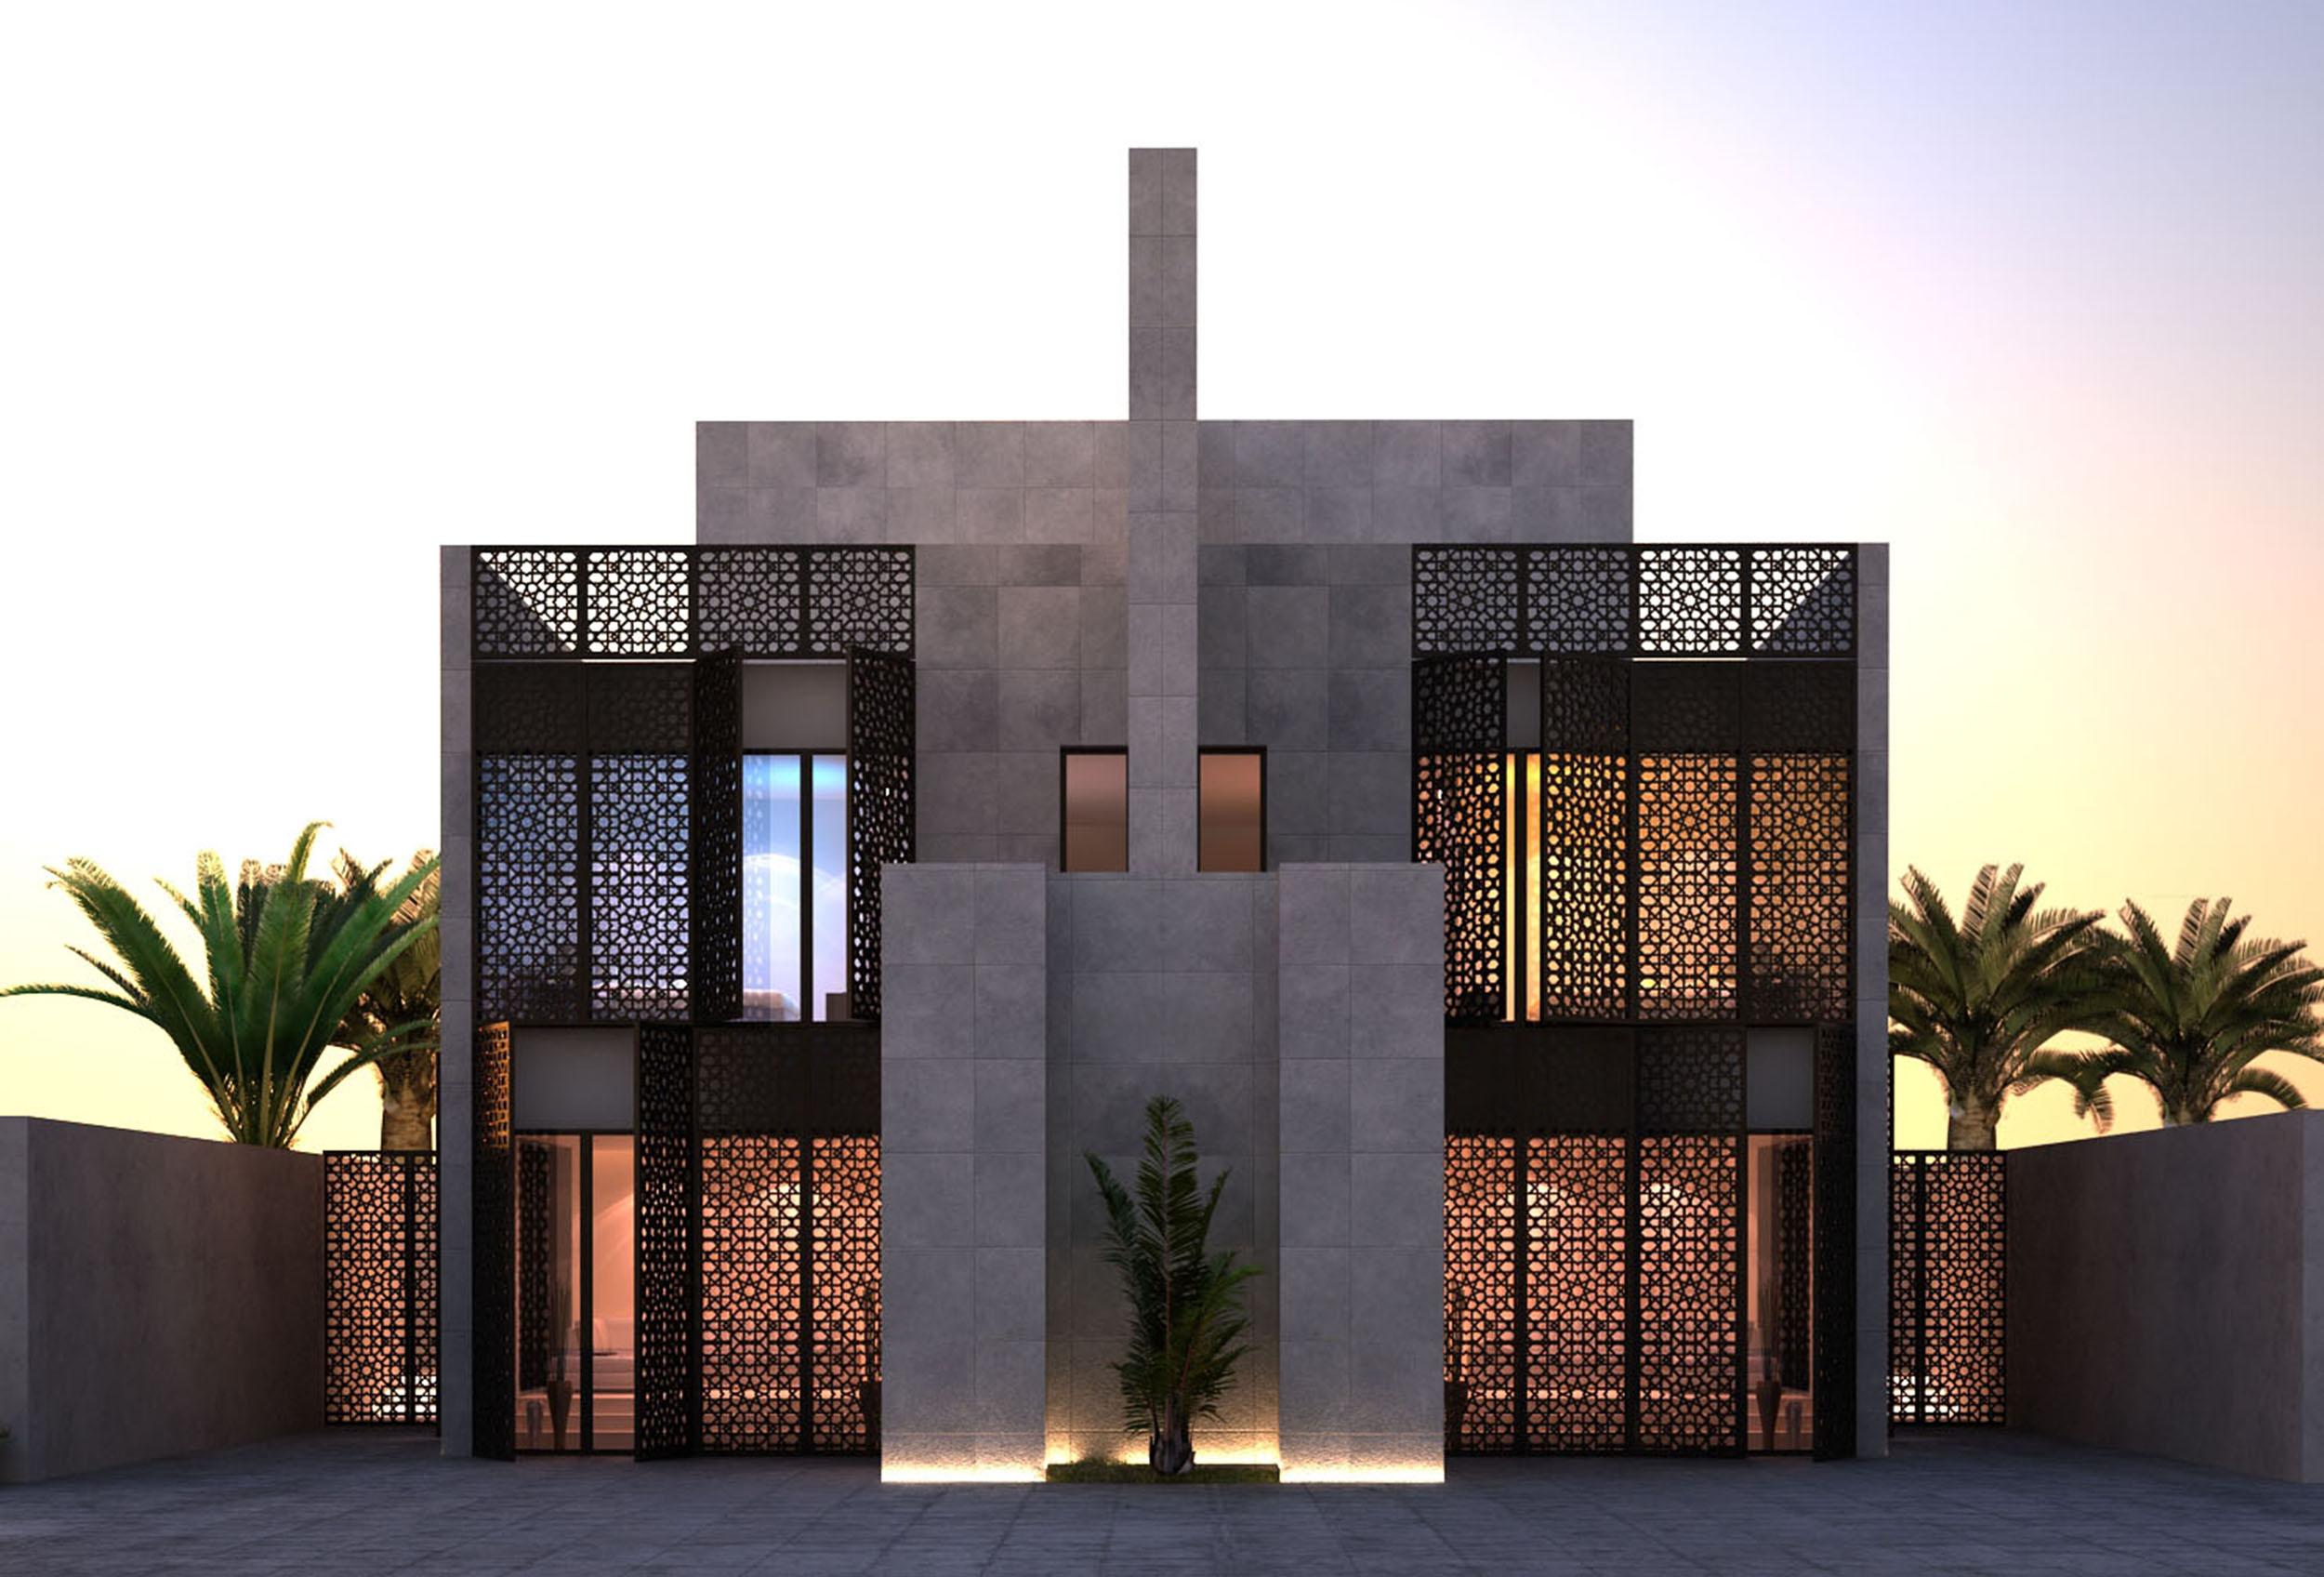 73 fachadas de casas ideias para inspirar arquidicas for Residential architectural plans for sale